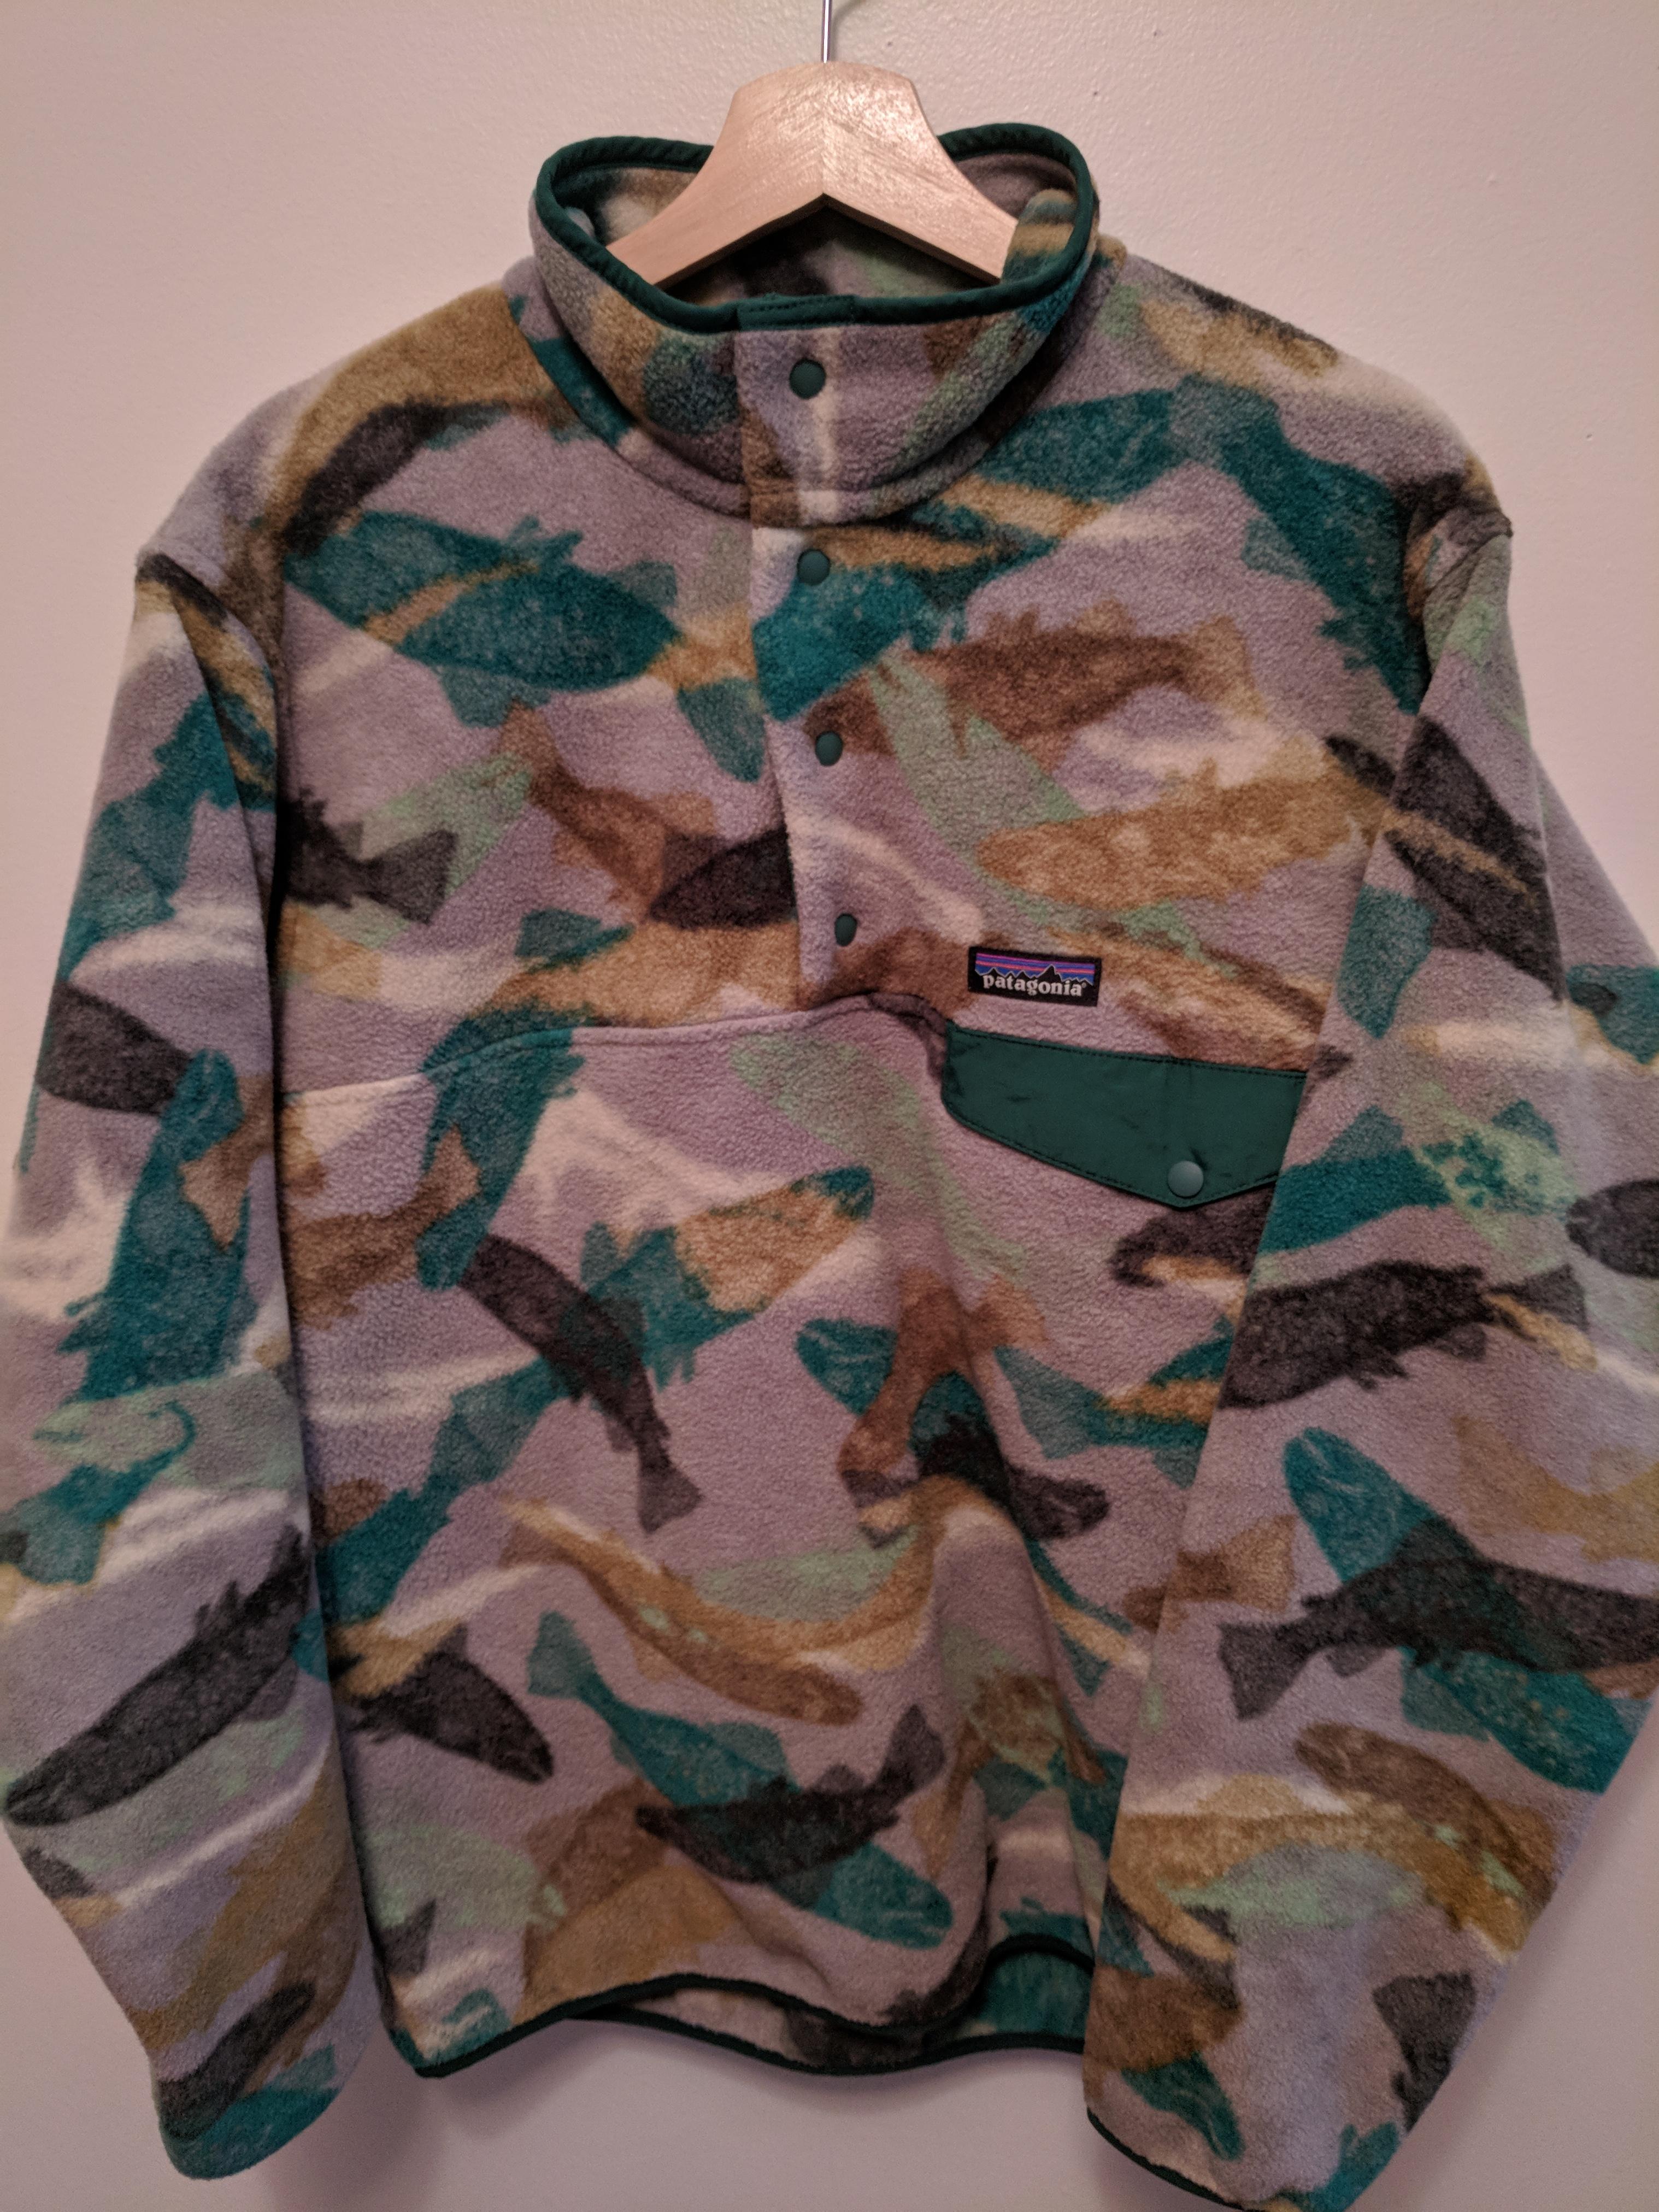 7402d429dfc50 Patagonia Camo Synchilla Fleece Pullover | Grailed